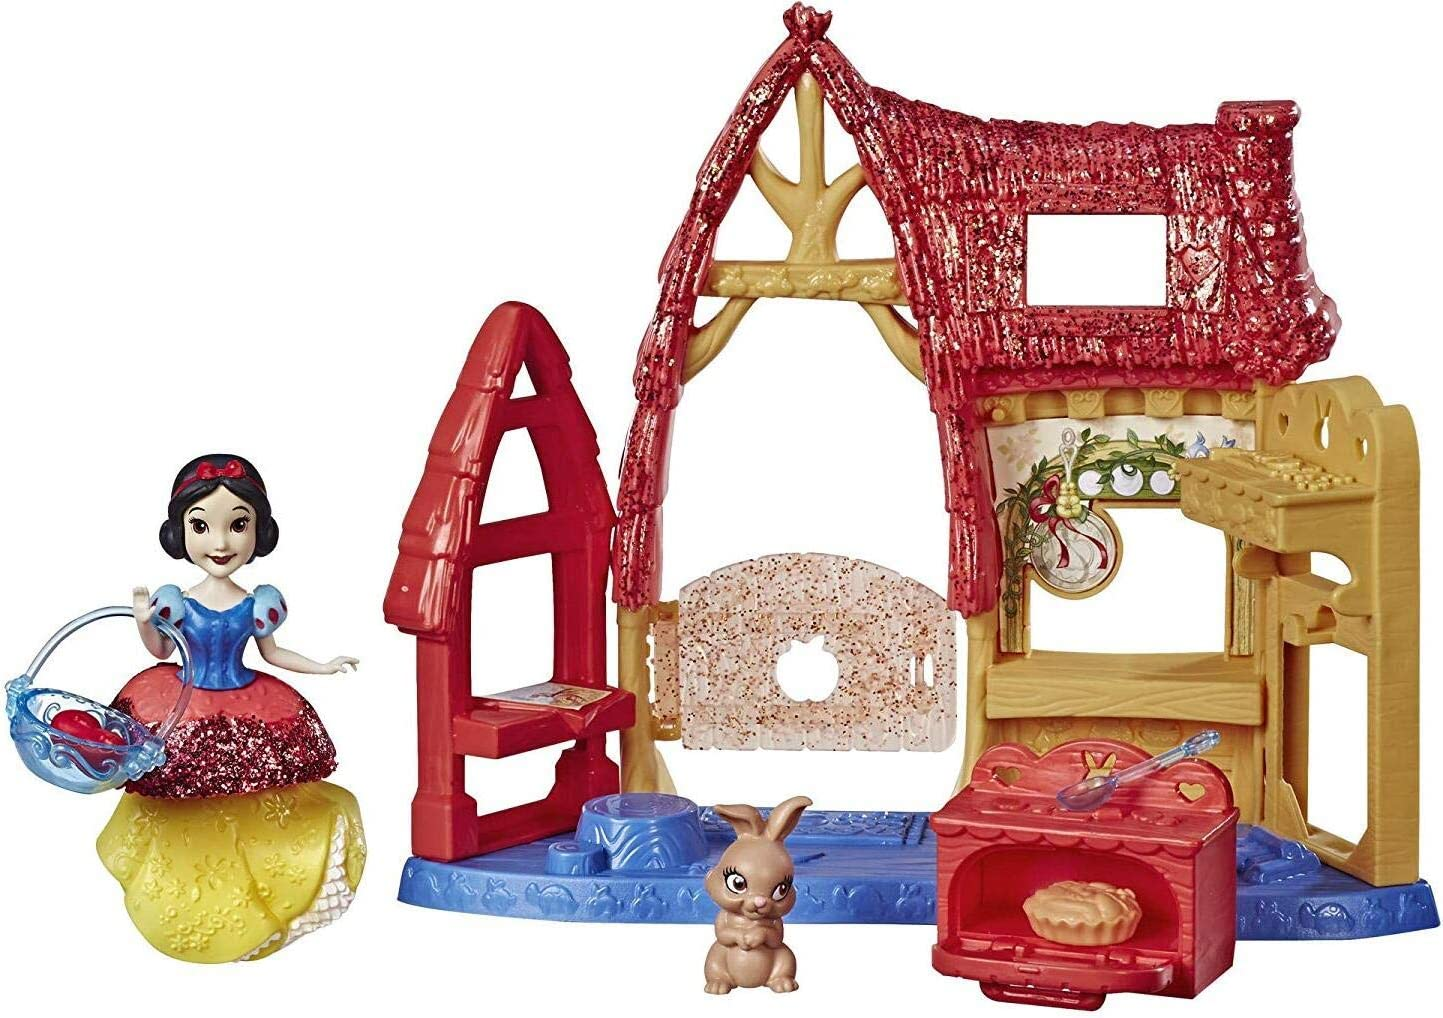 Disney Princess Cottage Kitchen & Snow White Doll, Royal Clips Fashion, One-Clip Skirt